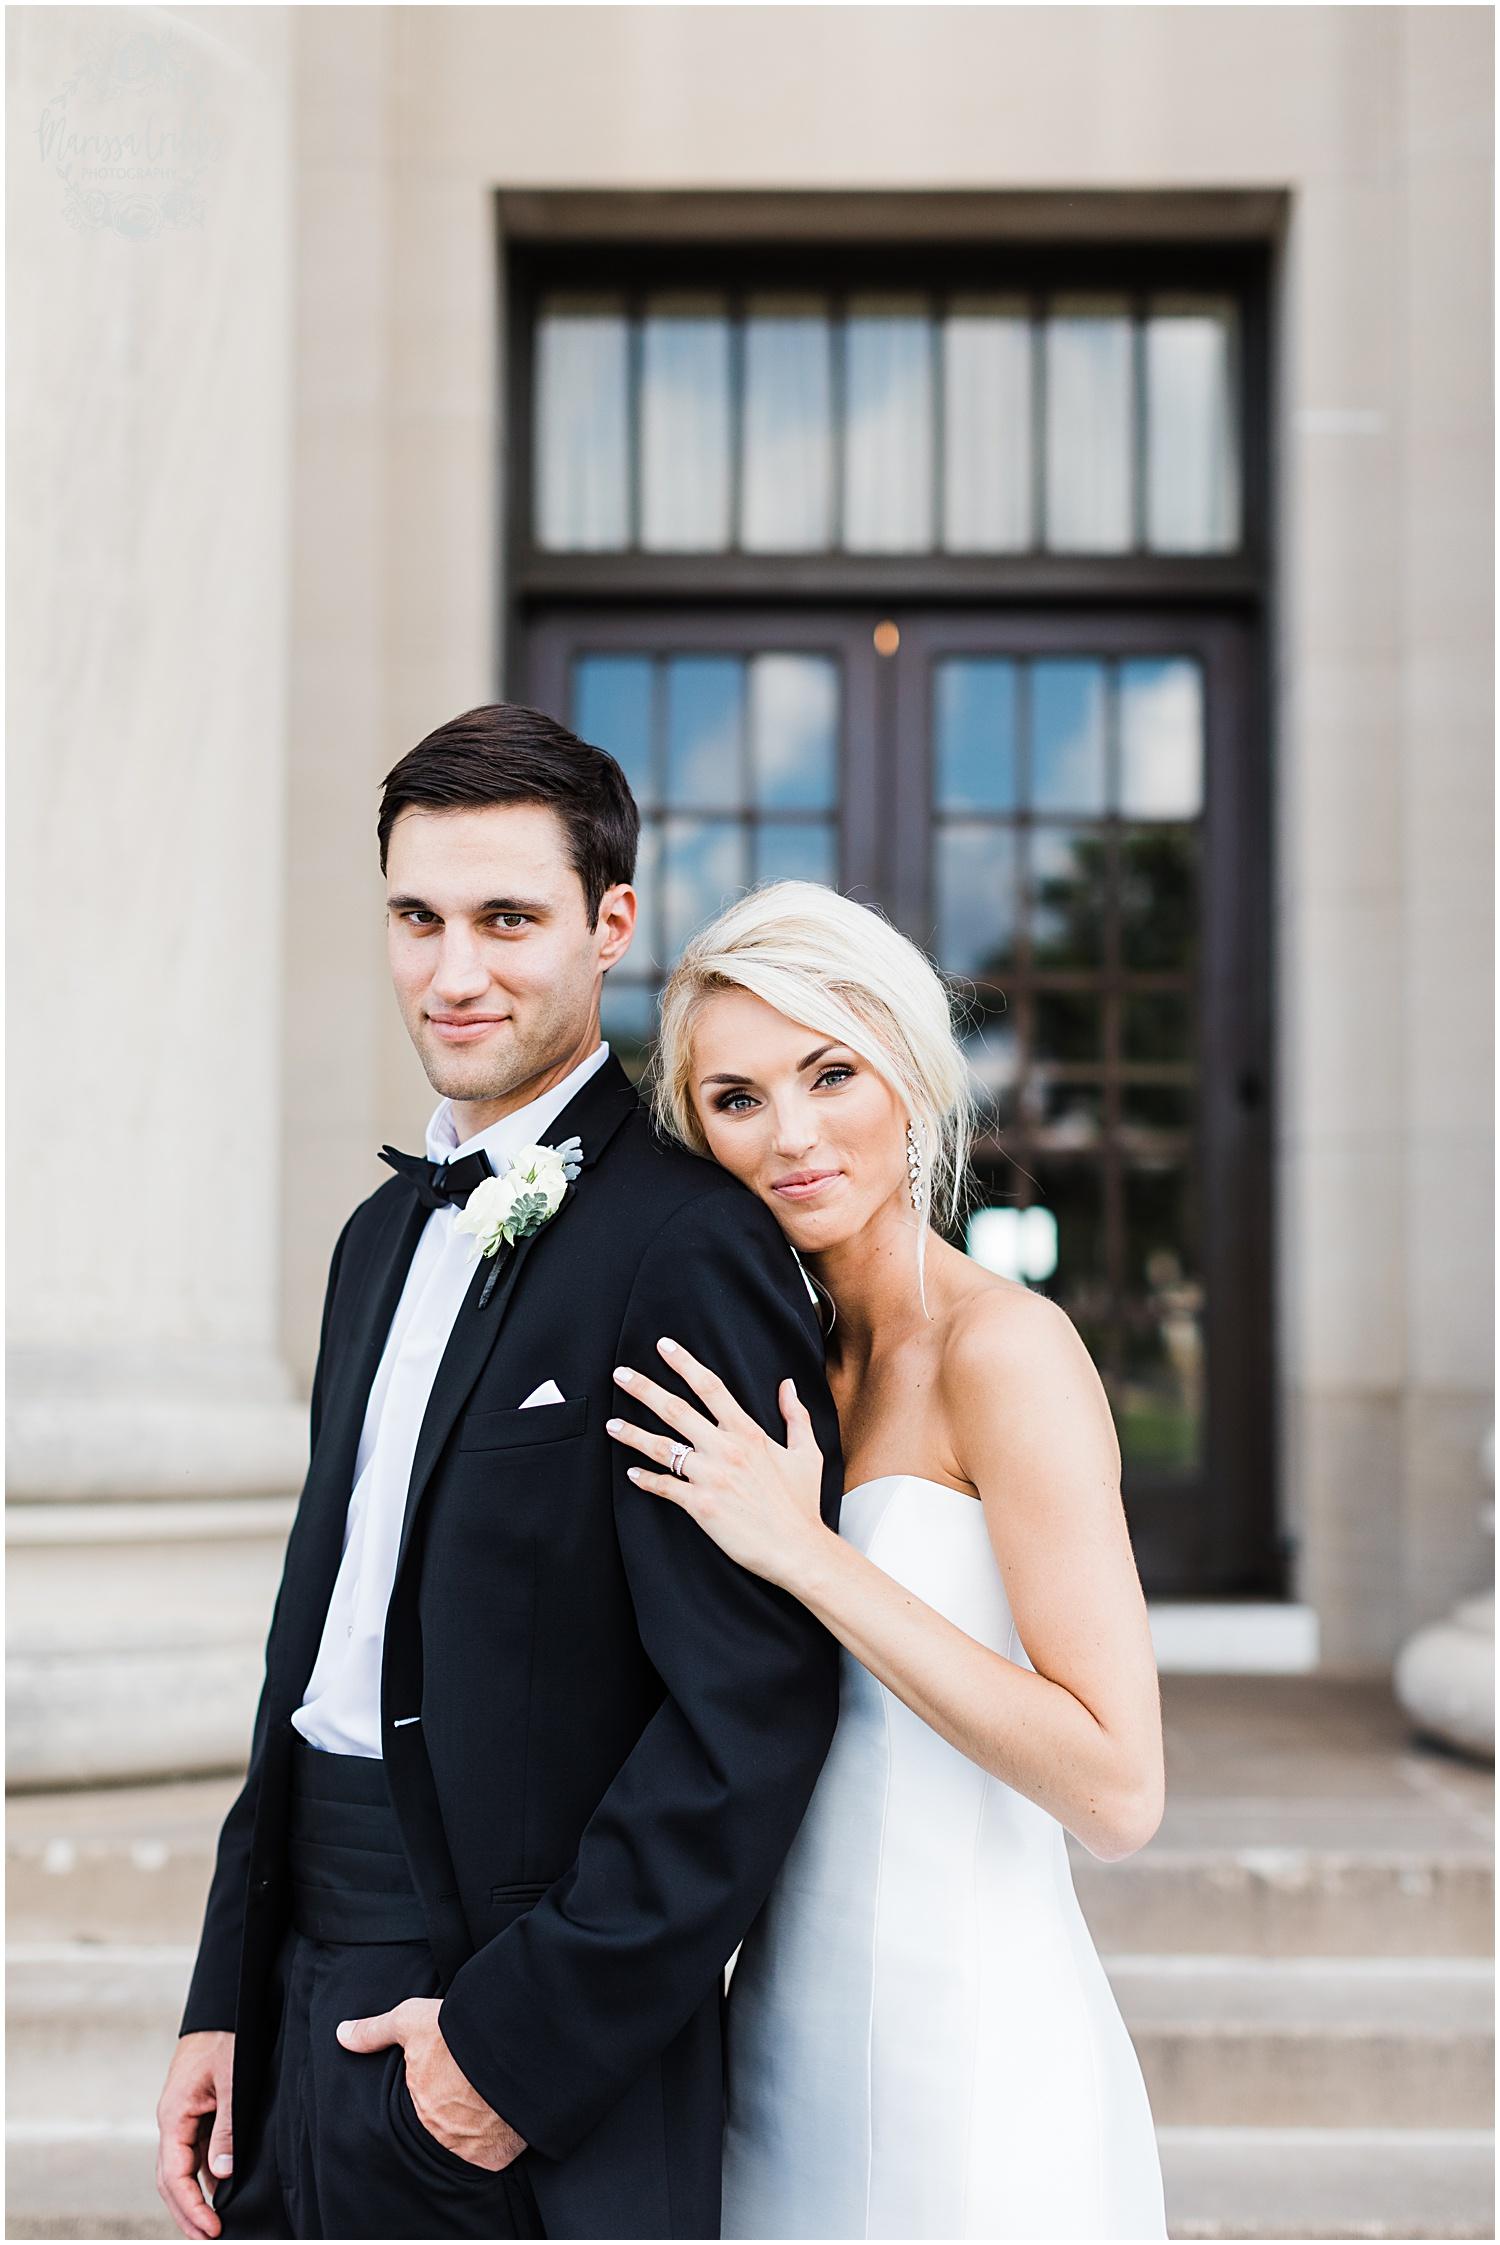 NOLL WEDDING | THE BRASS ON BALTIMORE | MARISSA CRIBBS PHOTOGRAPHY_6334.jpg